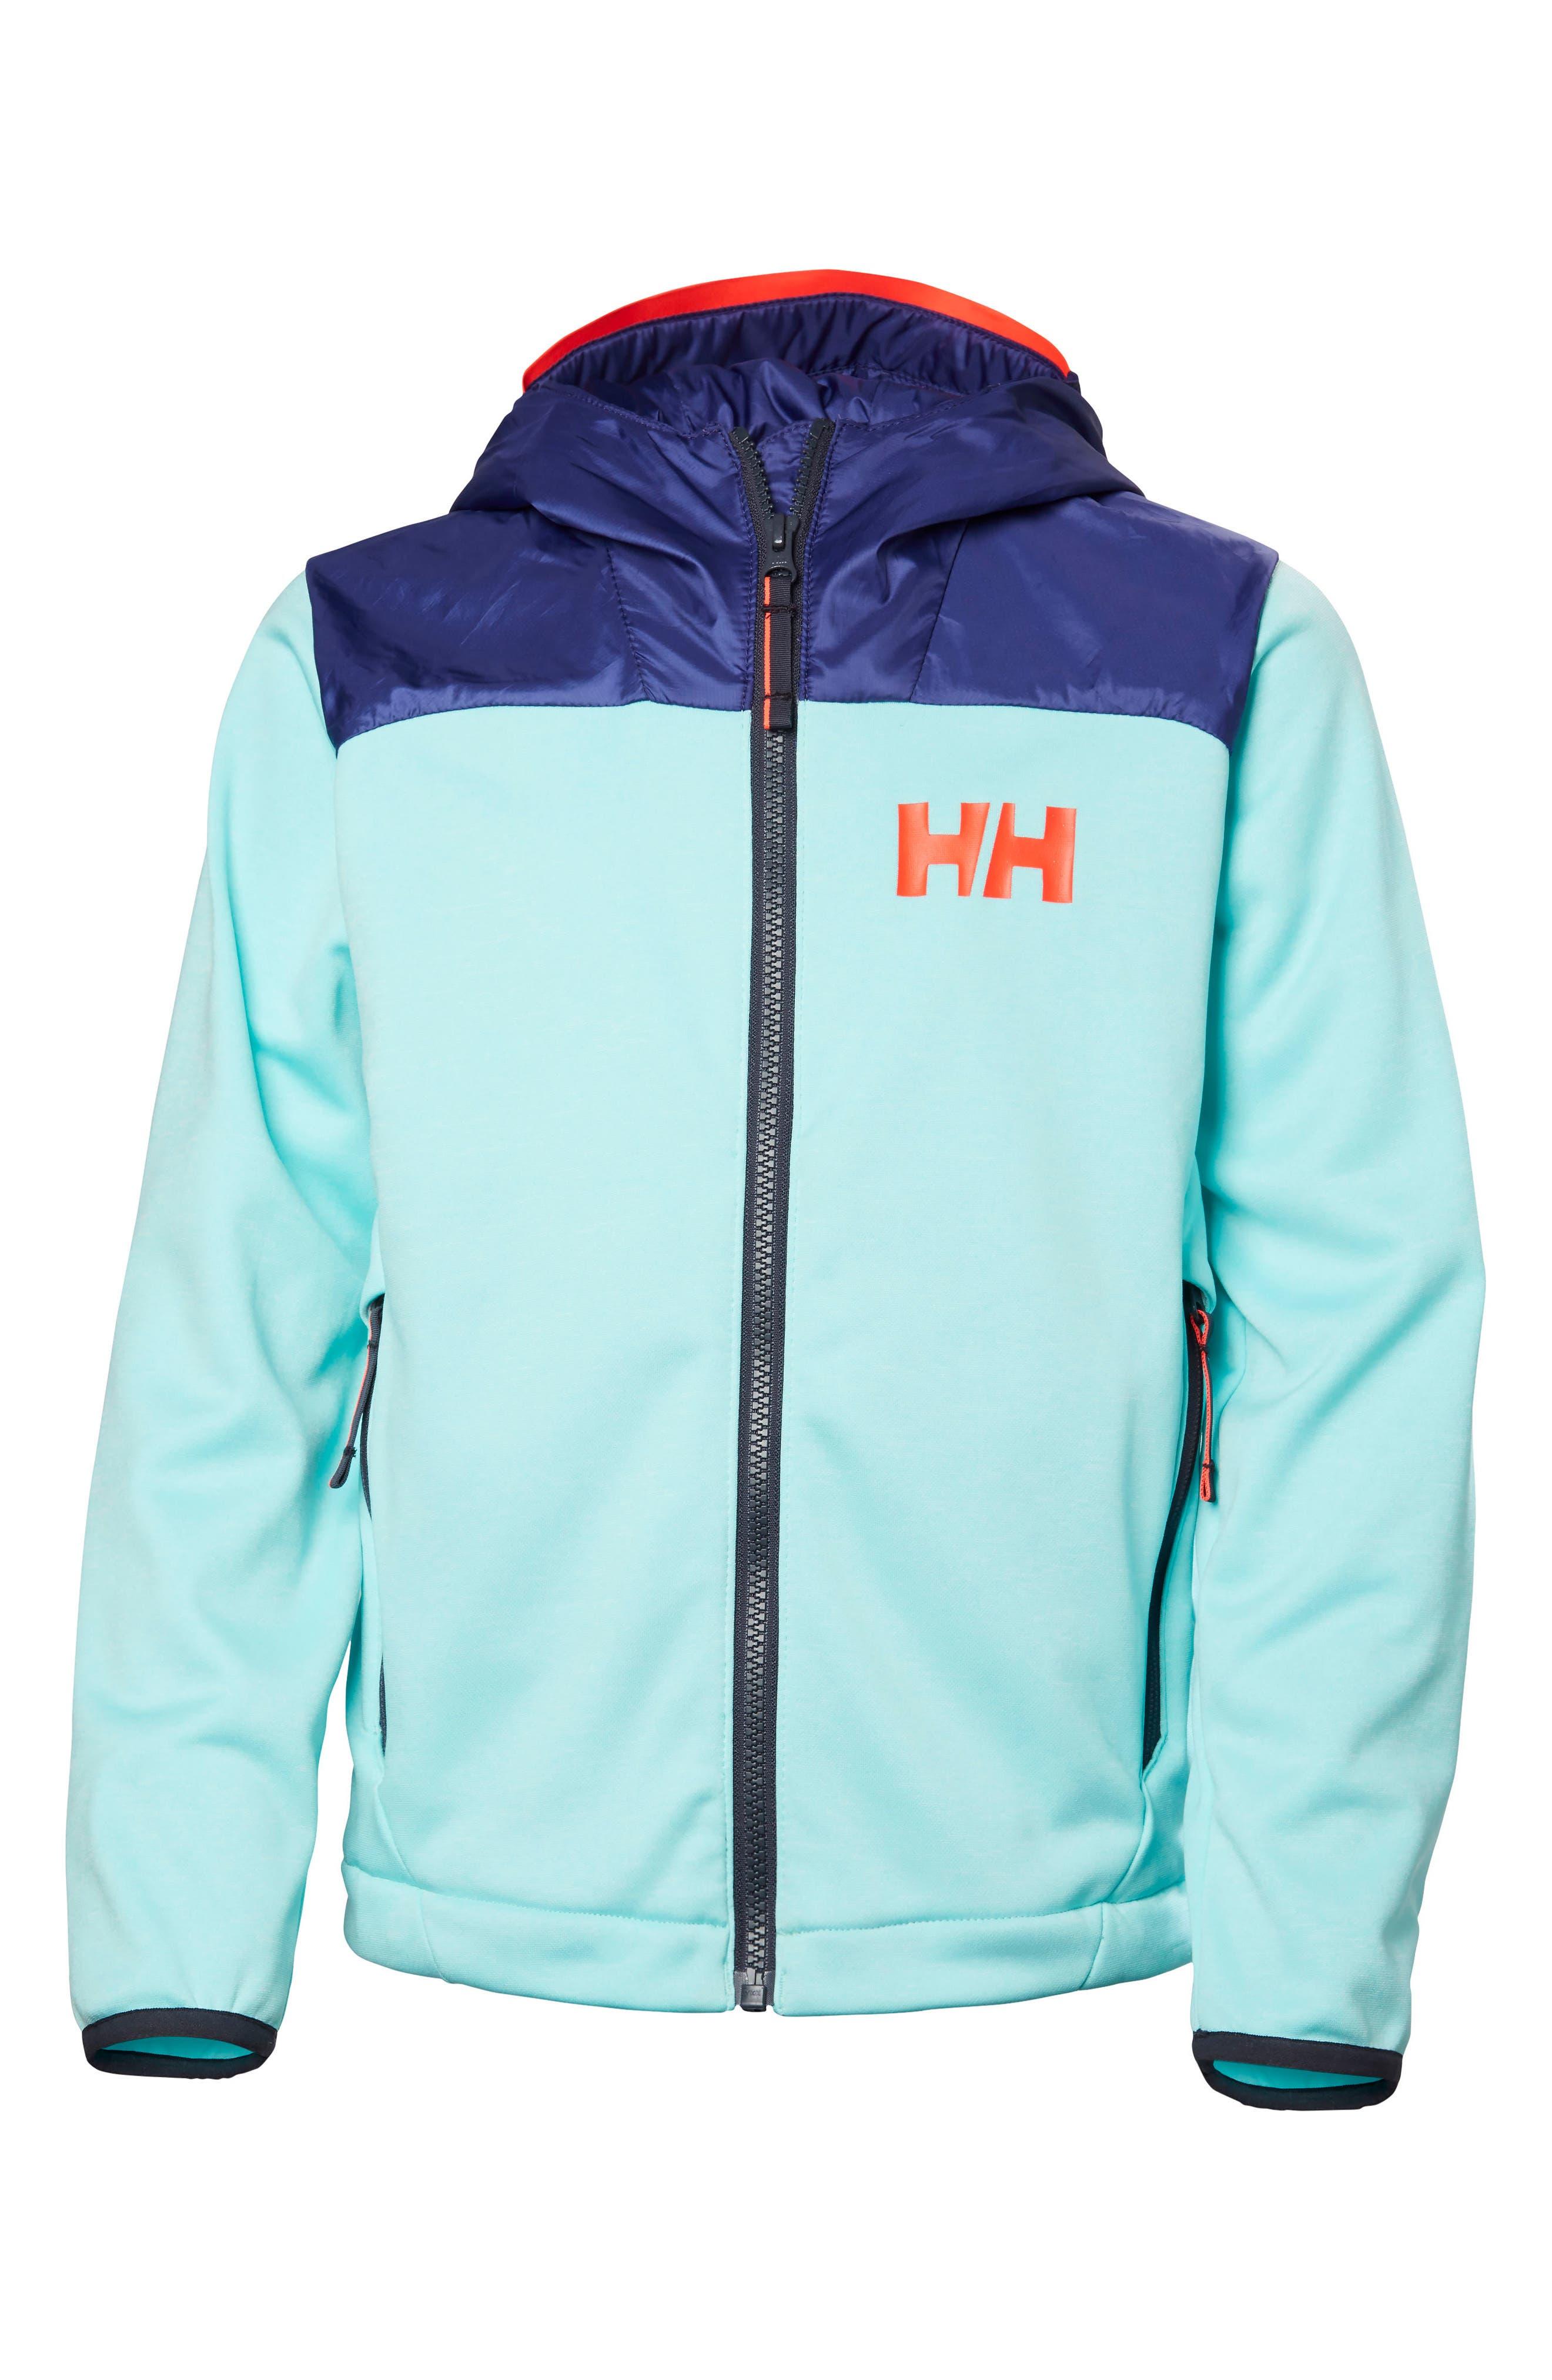 Alternate Image 1 Selected - Helly Hansen Hybrid Midlayer Jacket (Big Girls)